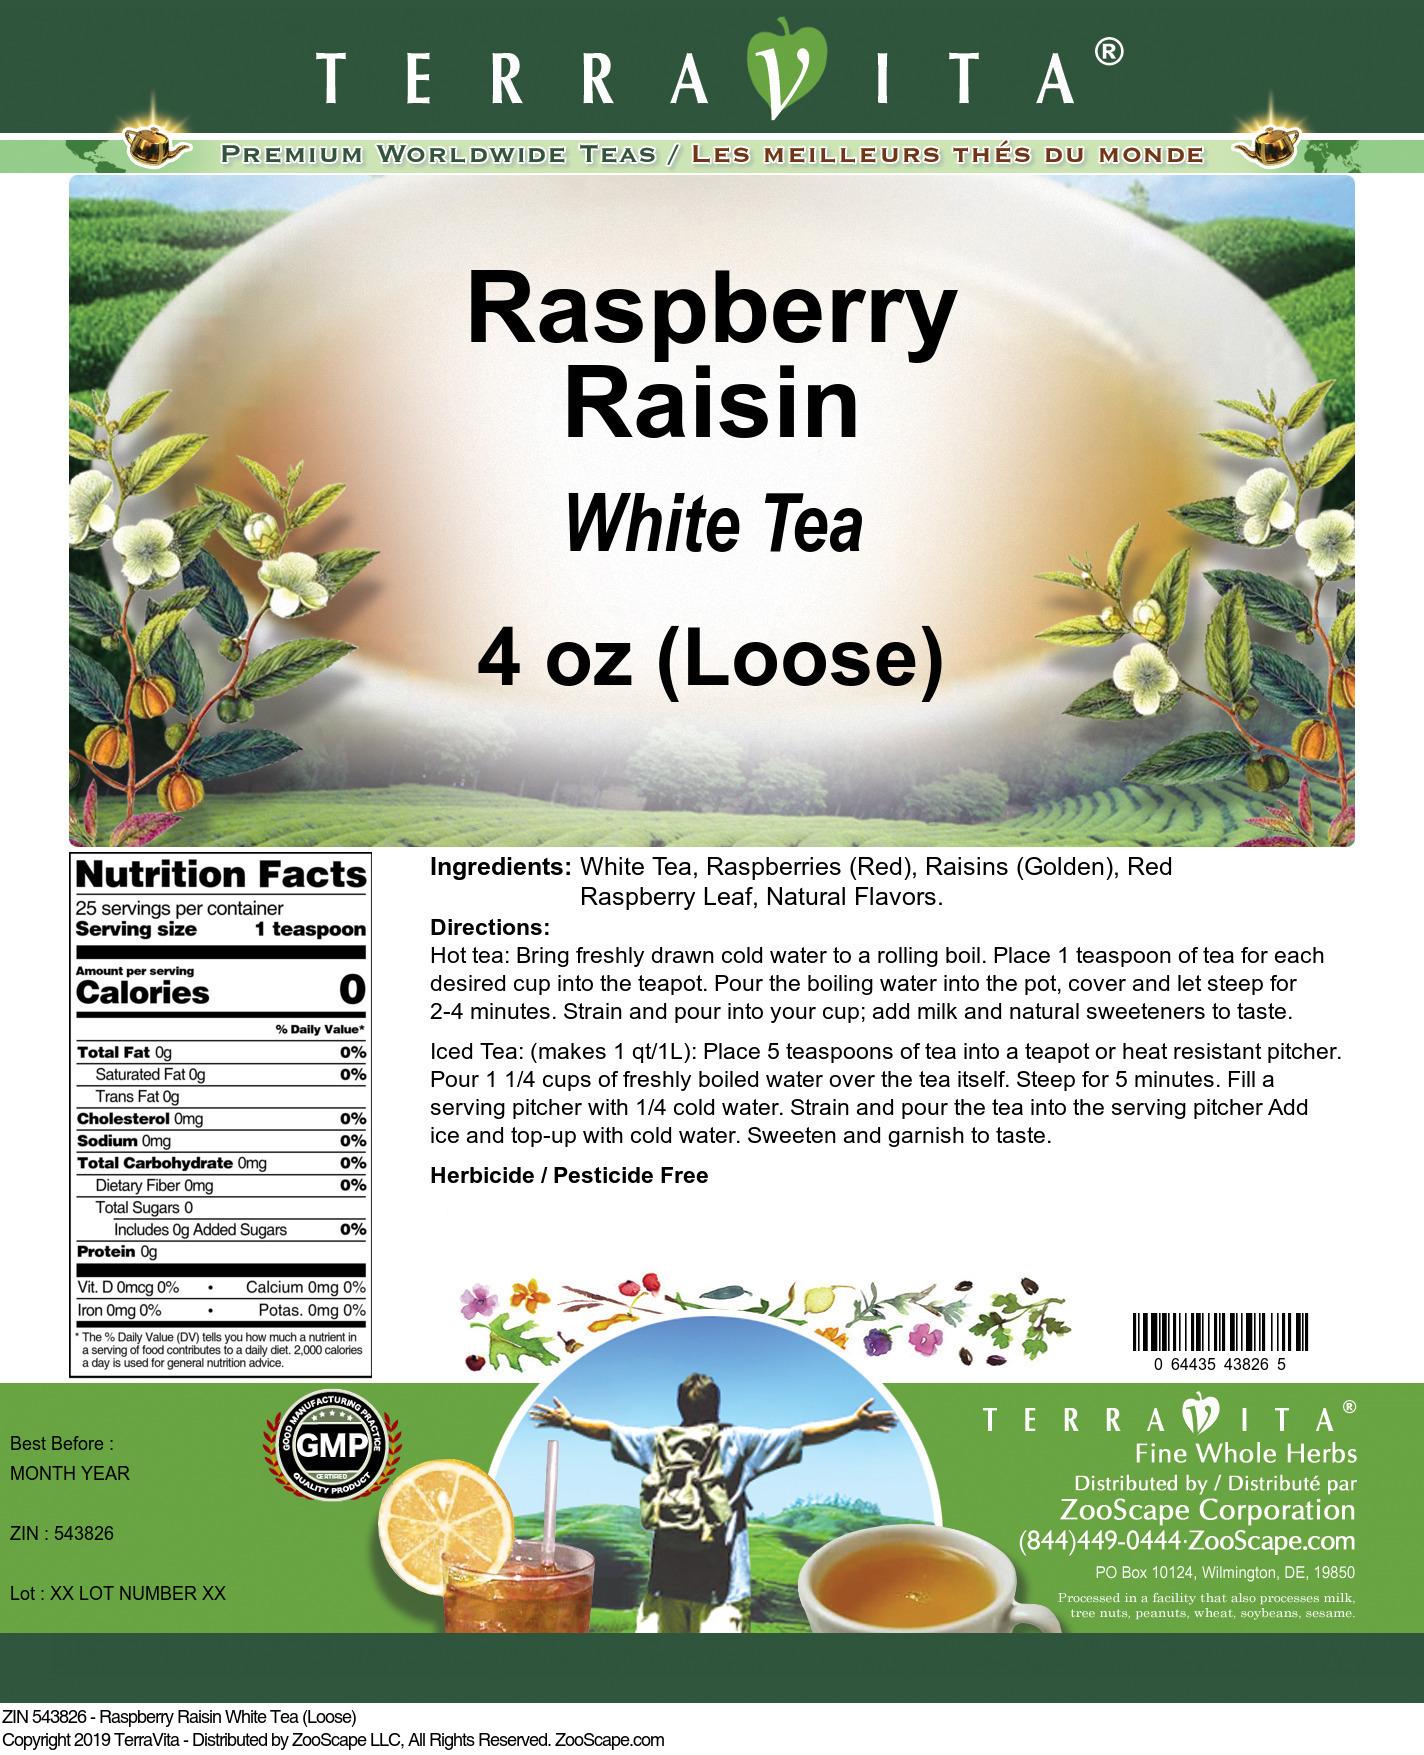 Raspberry Raisin White Tea (Loose)